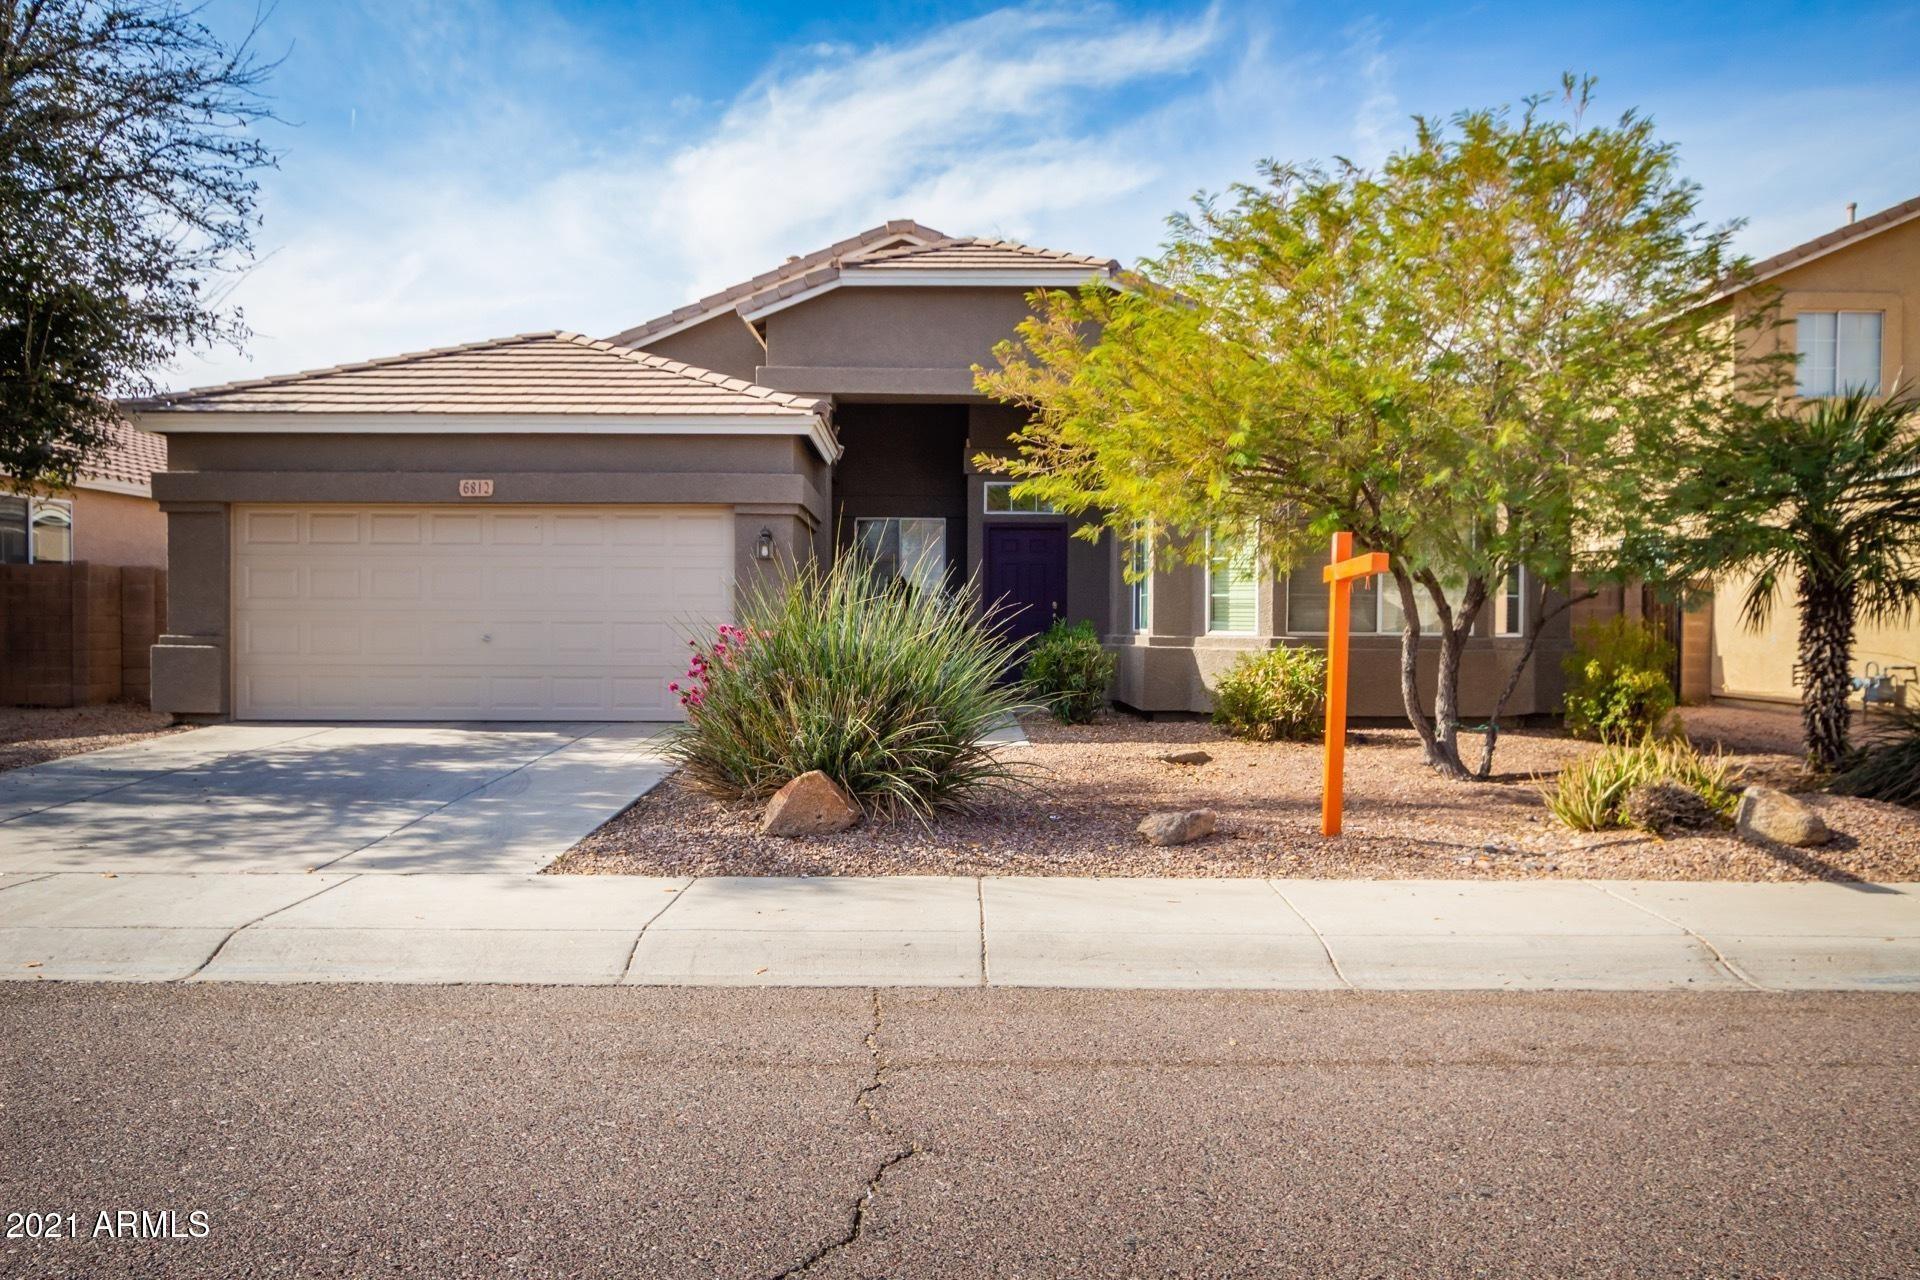 6812 S 33RD Avenue, Phoenix, AZ 85041 - MLS#: 6183666